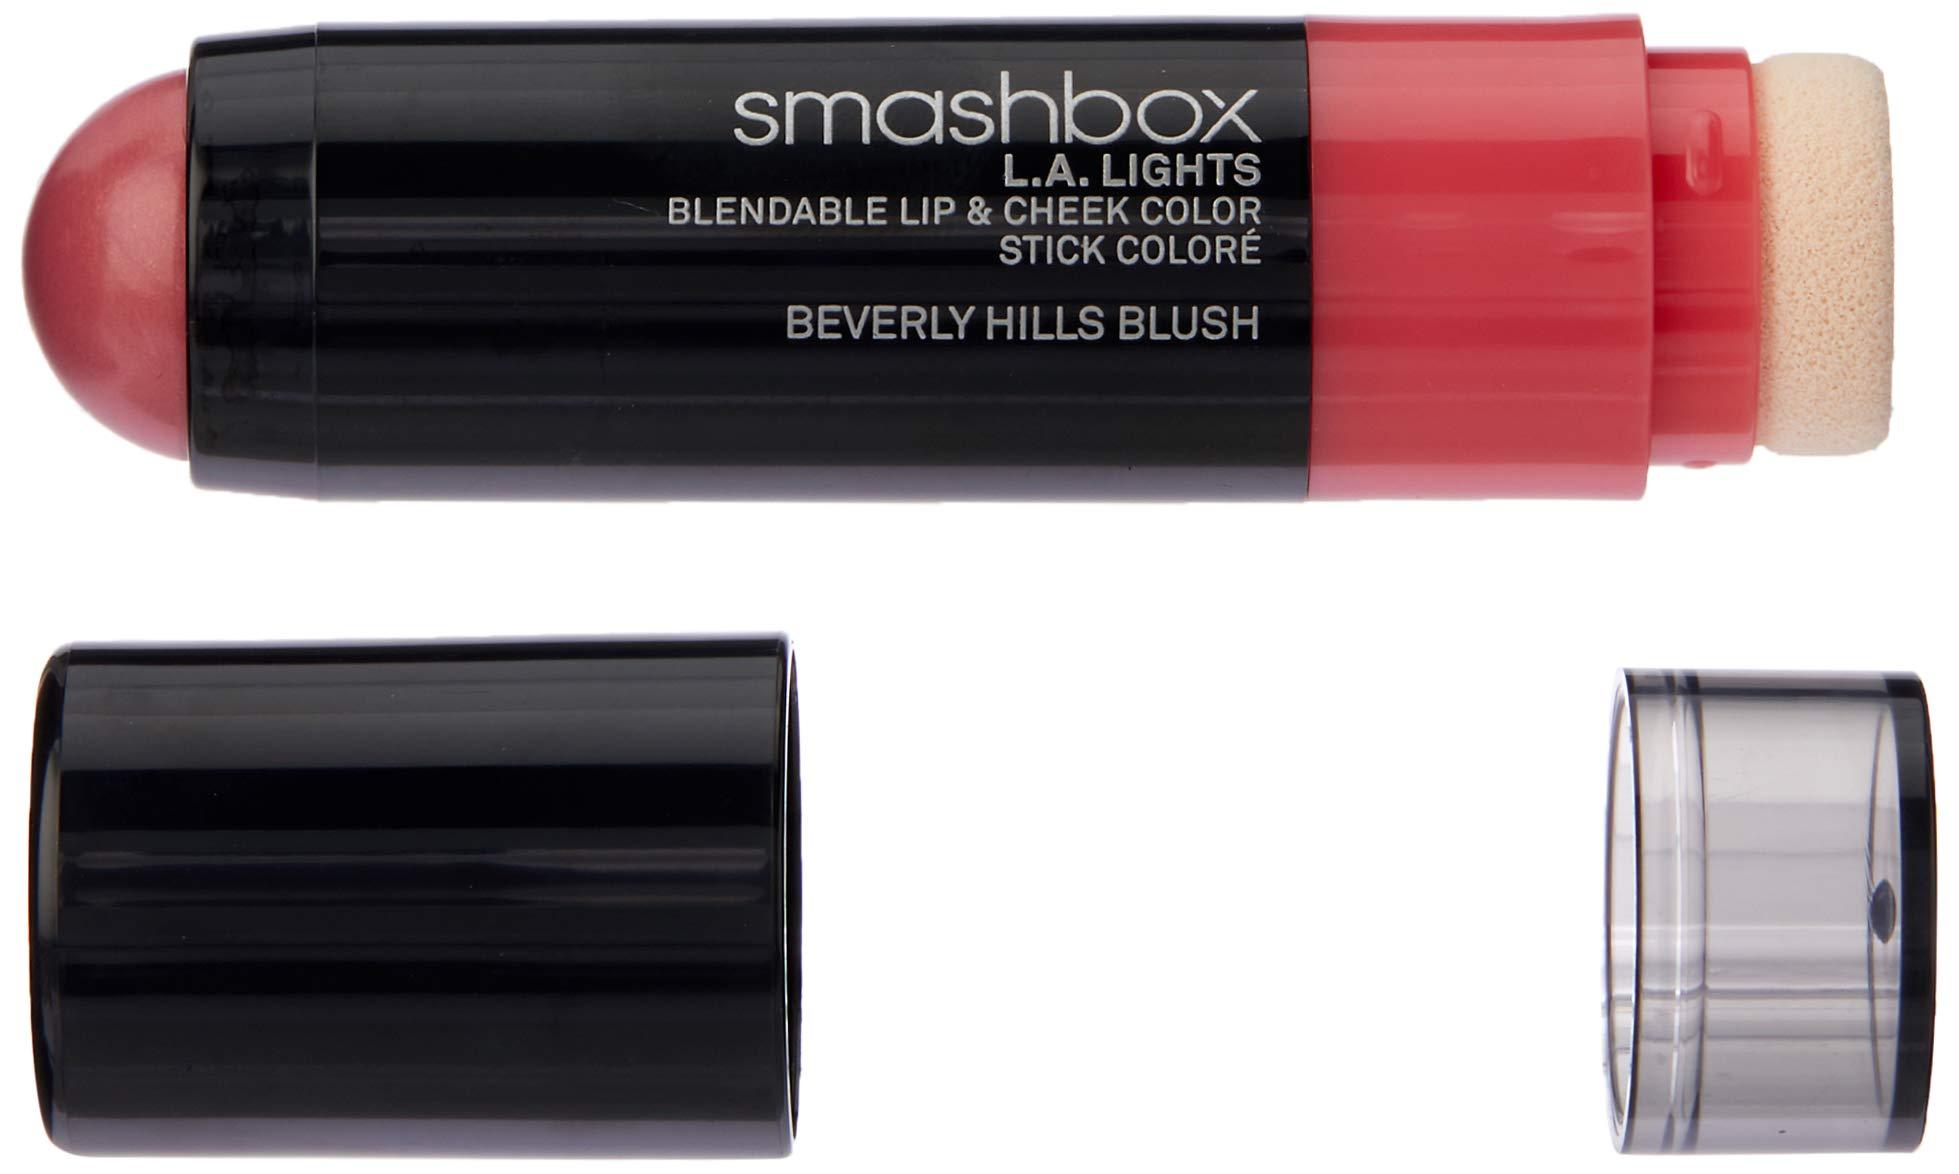 Smashbox Smashbox L.a. Lights Blendable Lip and Cheek Color Lipstick, Beverly Hills Blush, 0.17 Fluid Ounce